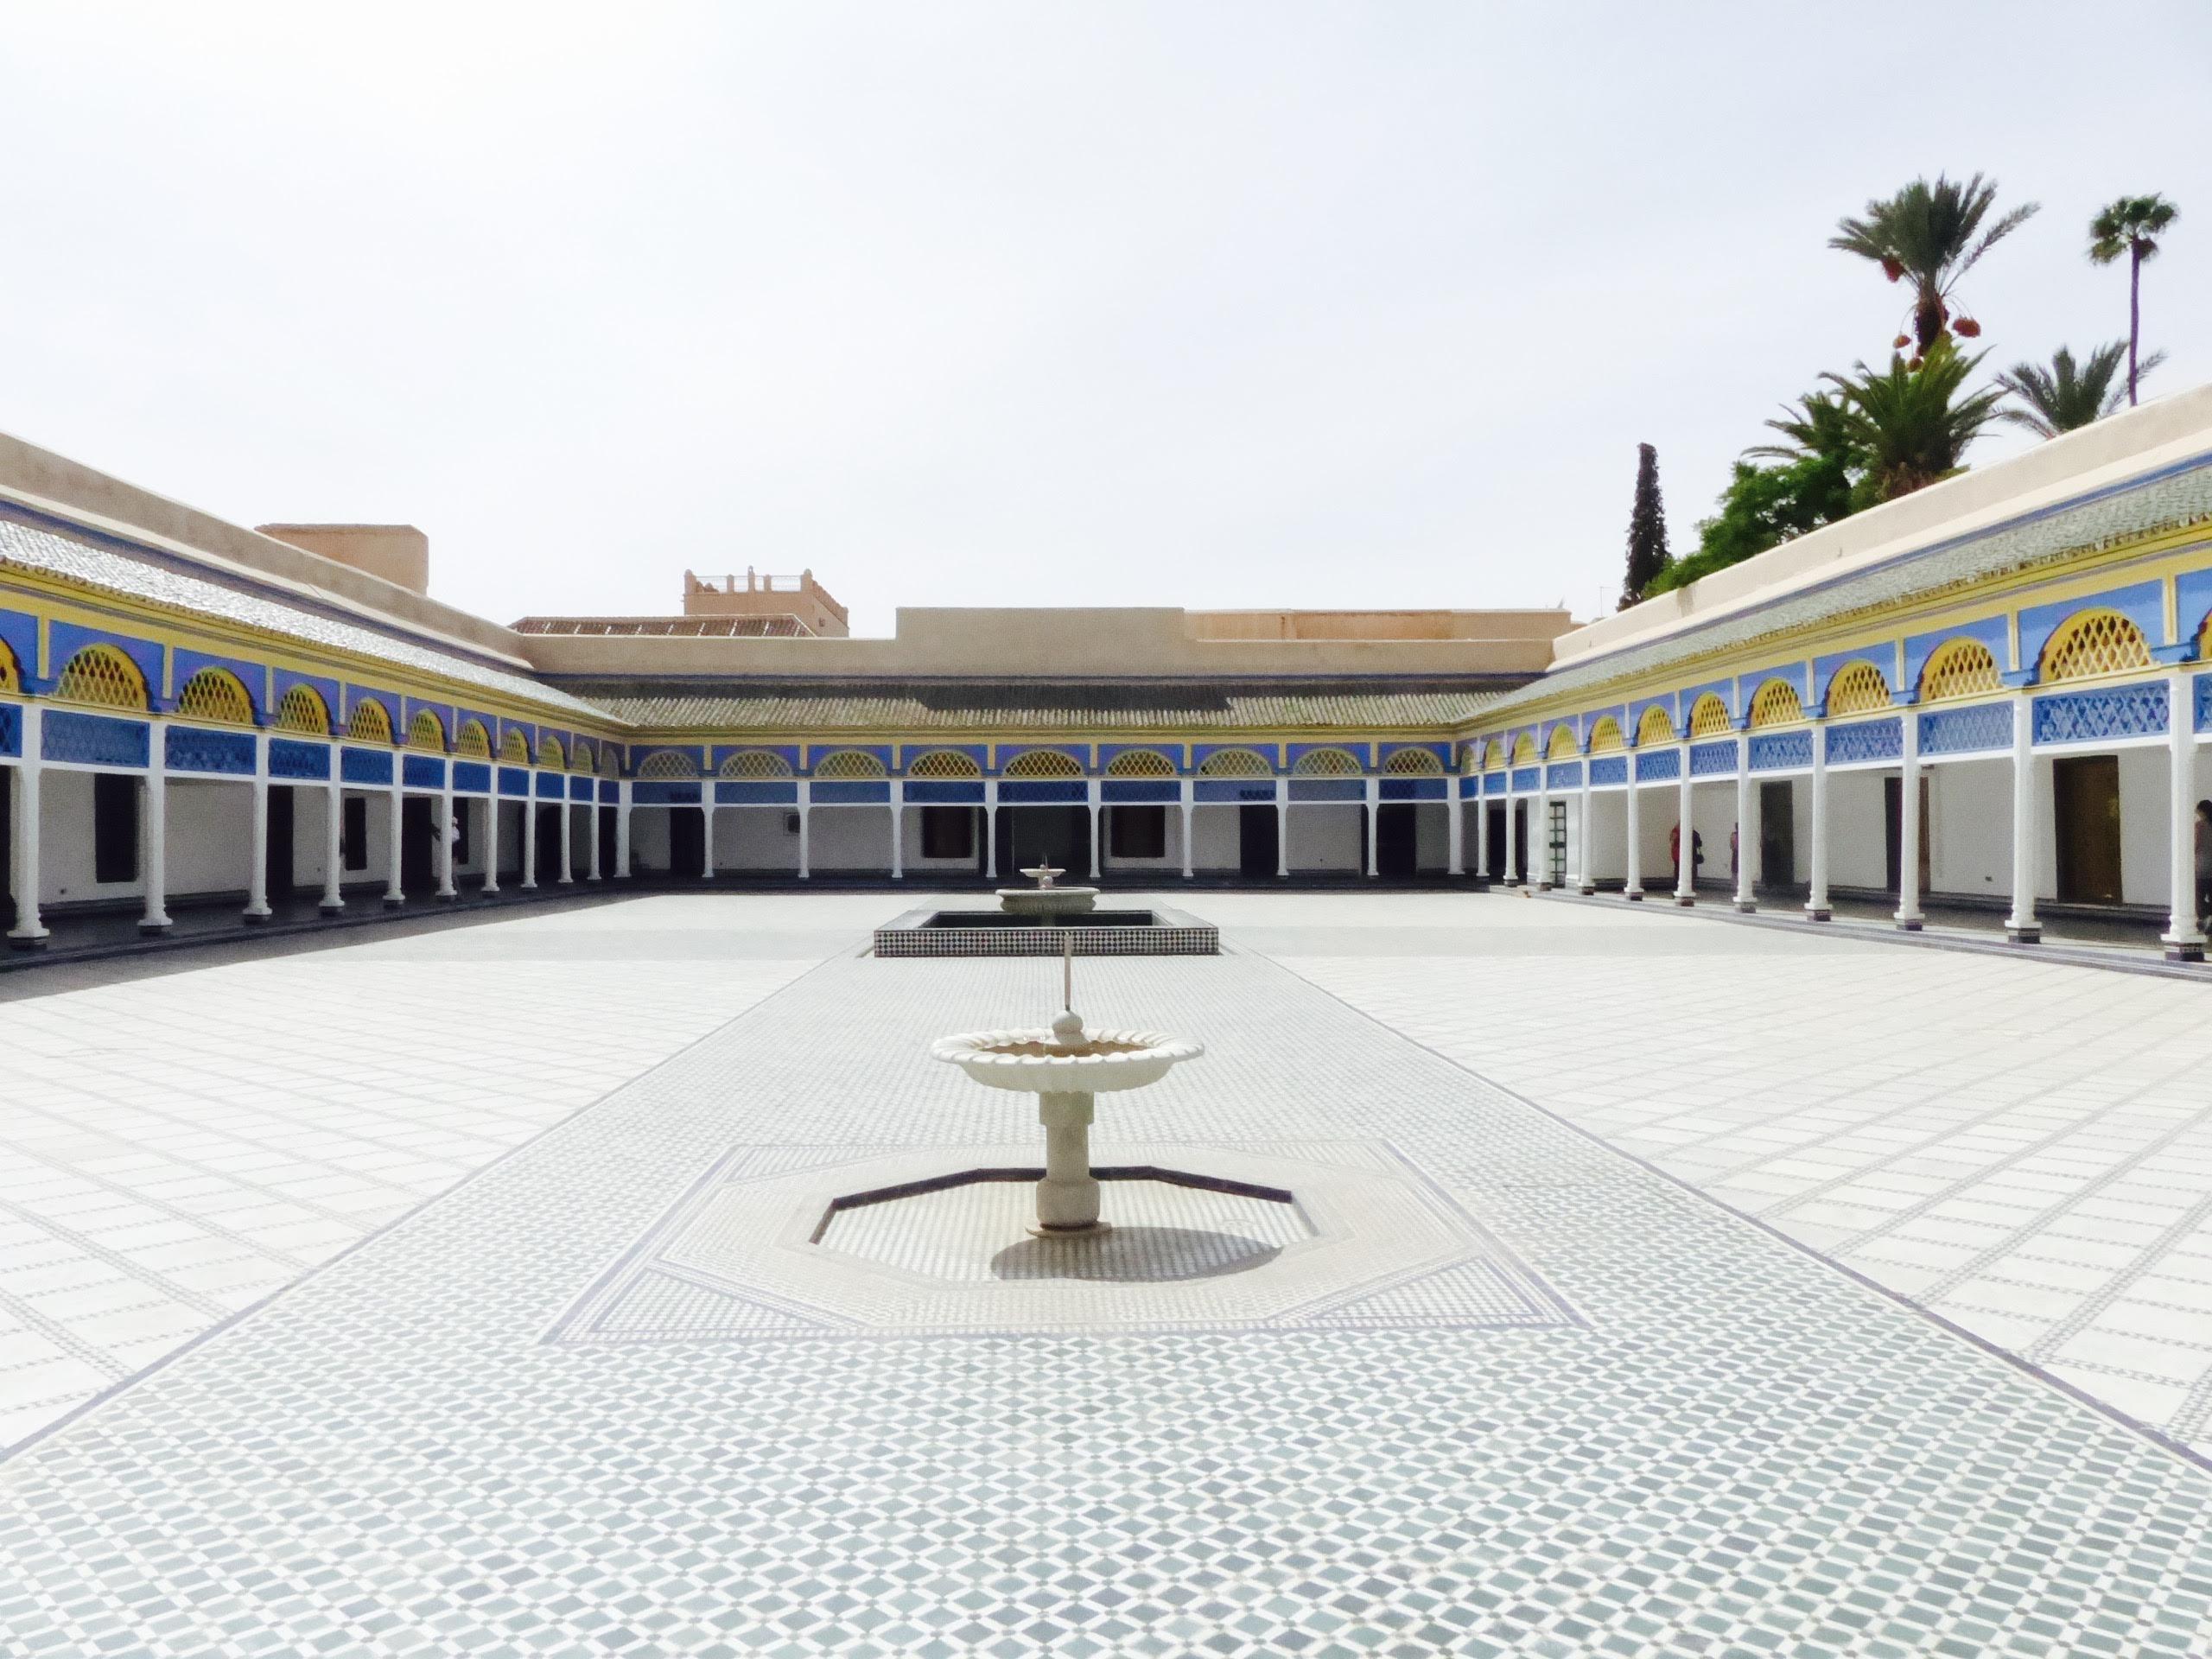 Blog voyage Marrakech Maroc itinéraire